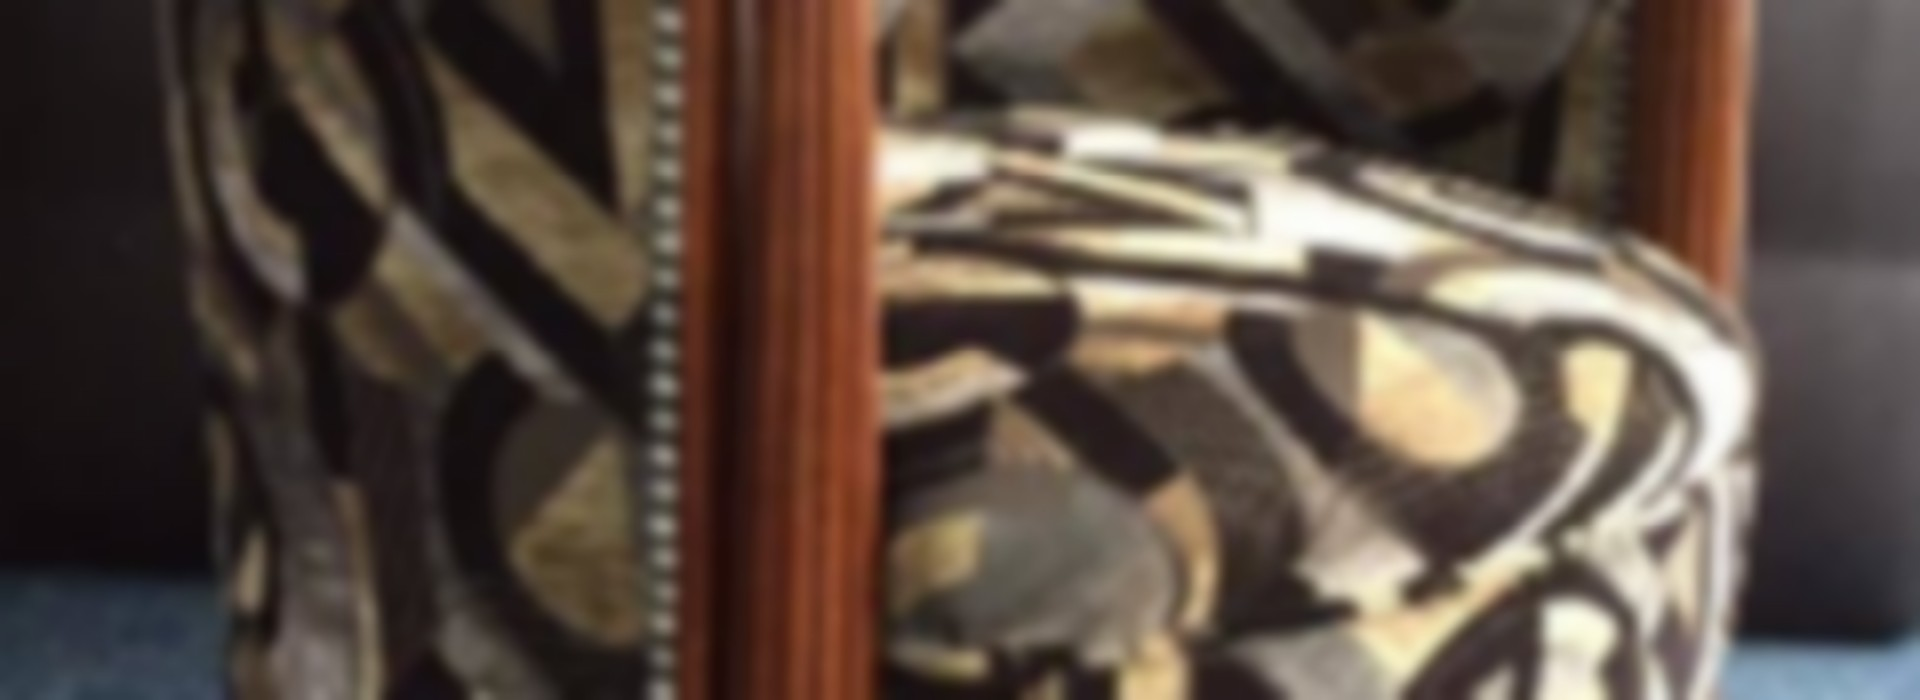 atelier comptoir du tapissier handwerke und know how entdecken frankreich pays de la loire. Black Bedroom Furniture Sets. Home Design Ideas